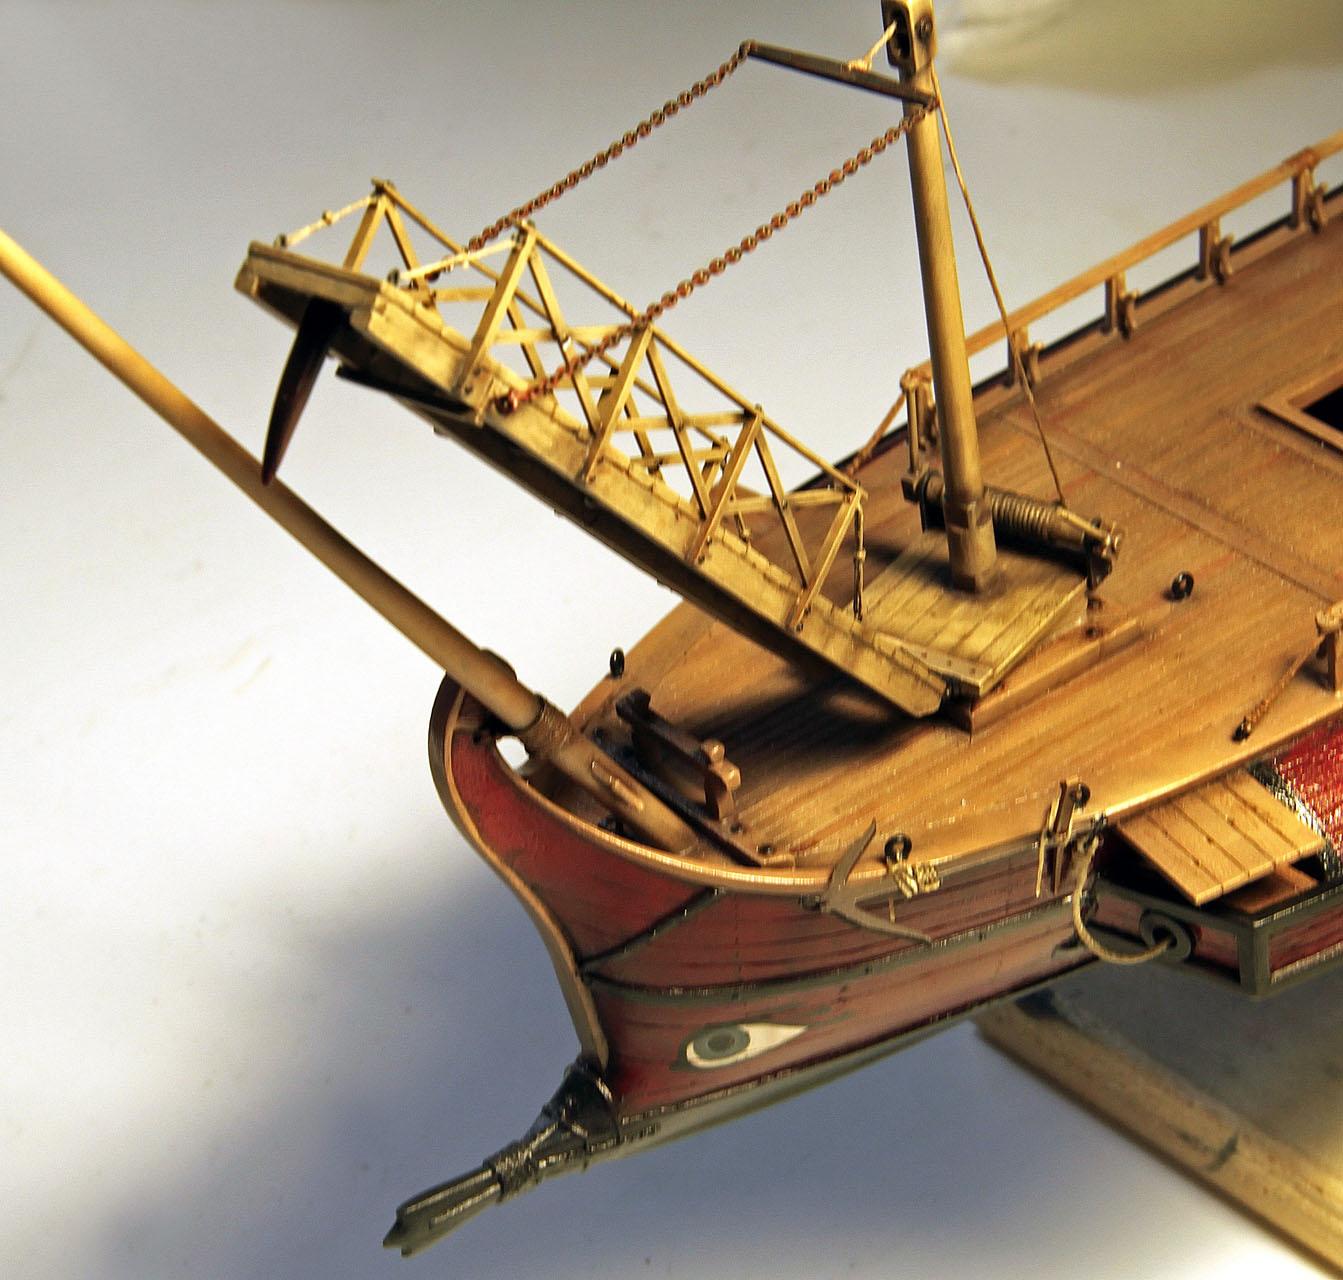 The ship model the work in progress